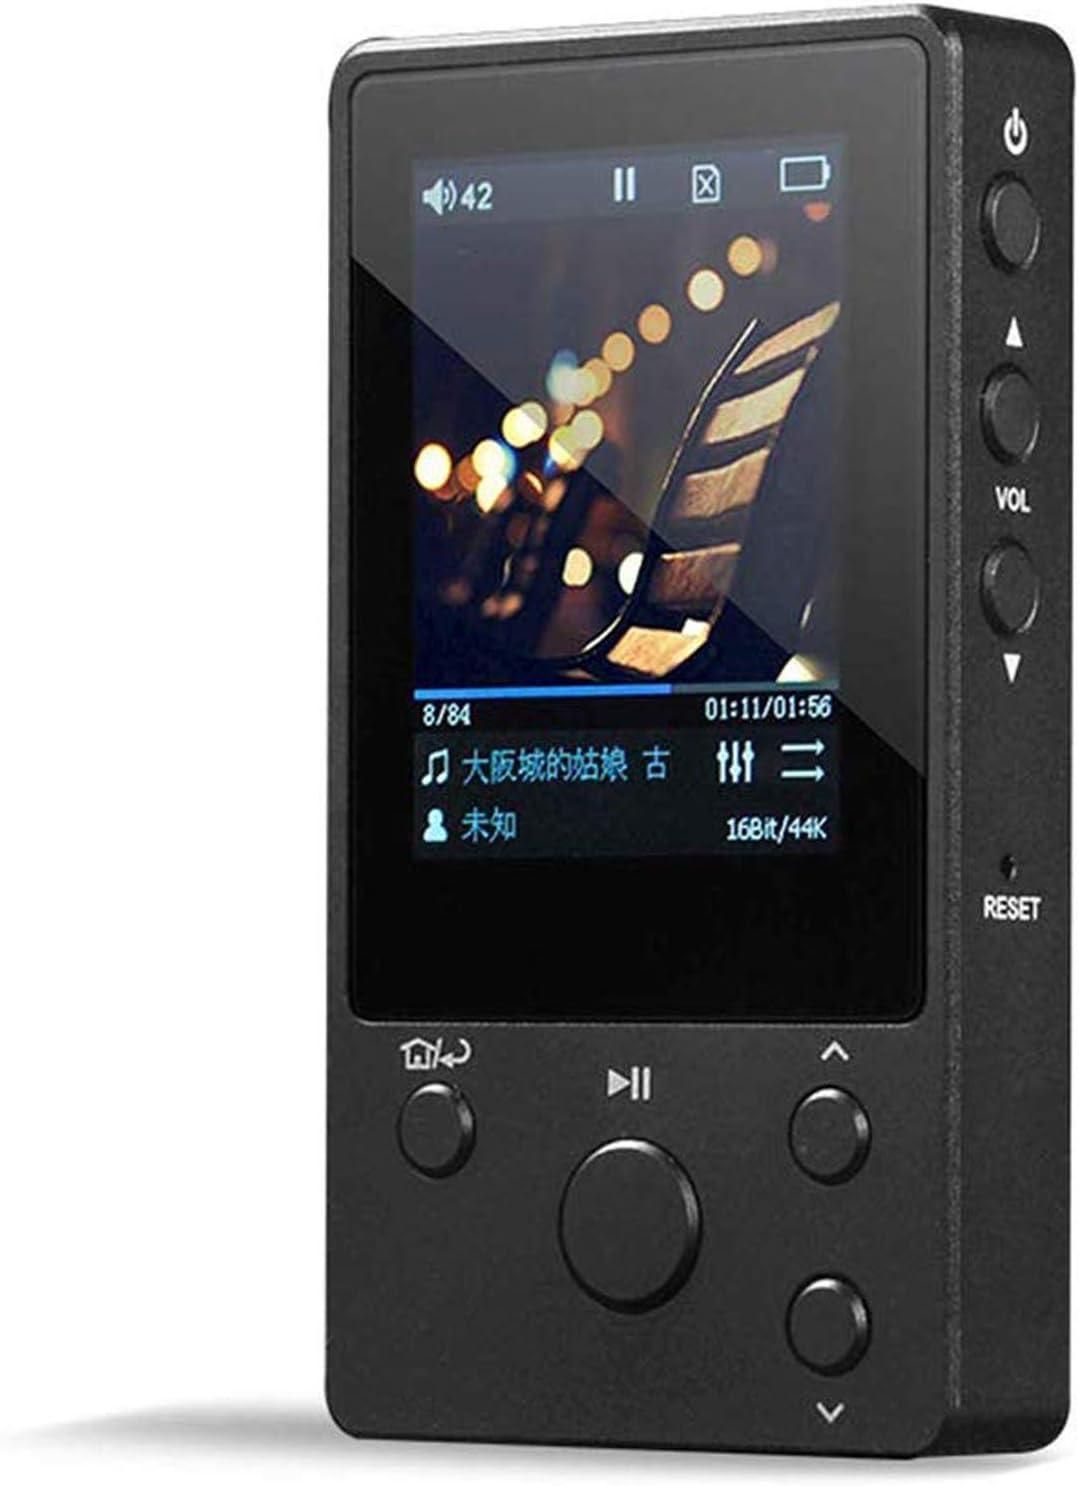 HAWK LI Mini MP3 Player, 8G High Fidelity Lossless HiFi MP3 Music Player, DSD256 Decode, Metal Body, Portable 2.0 inch IPS Screen CNC HiFi Player,...